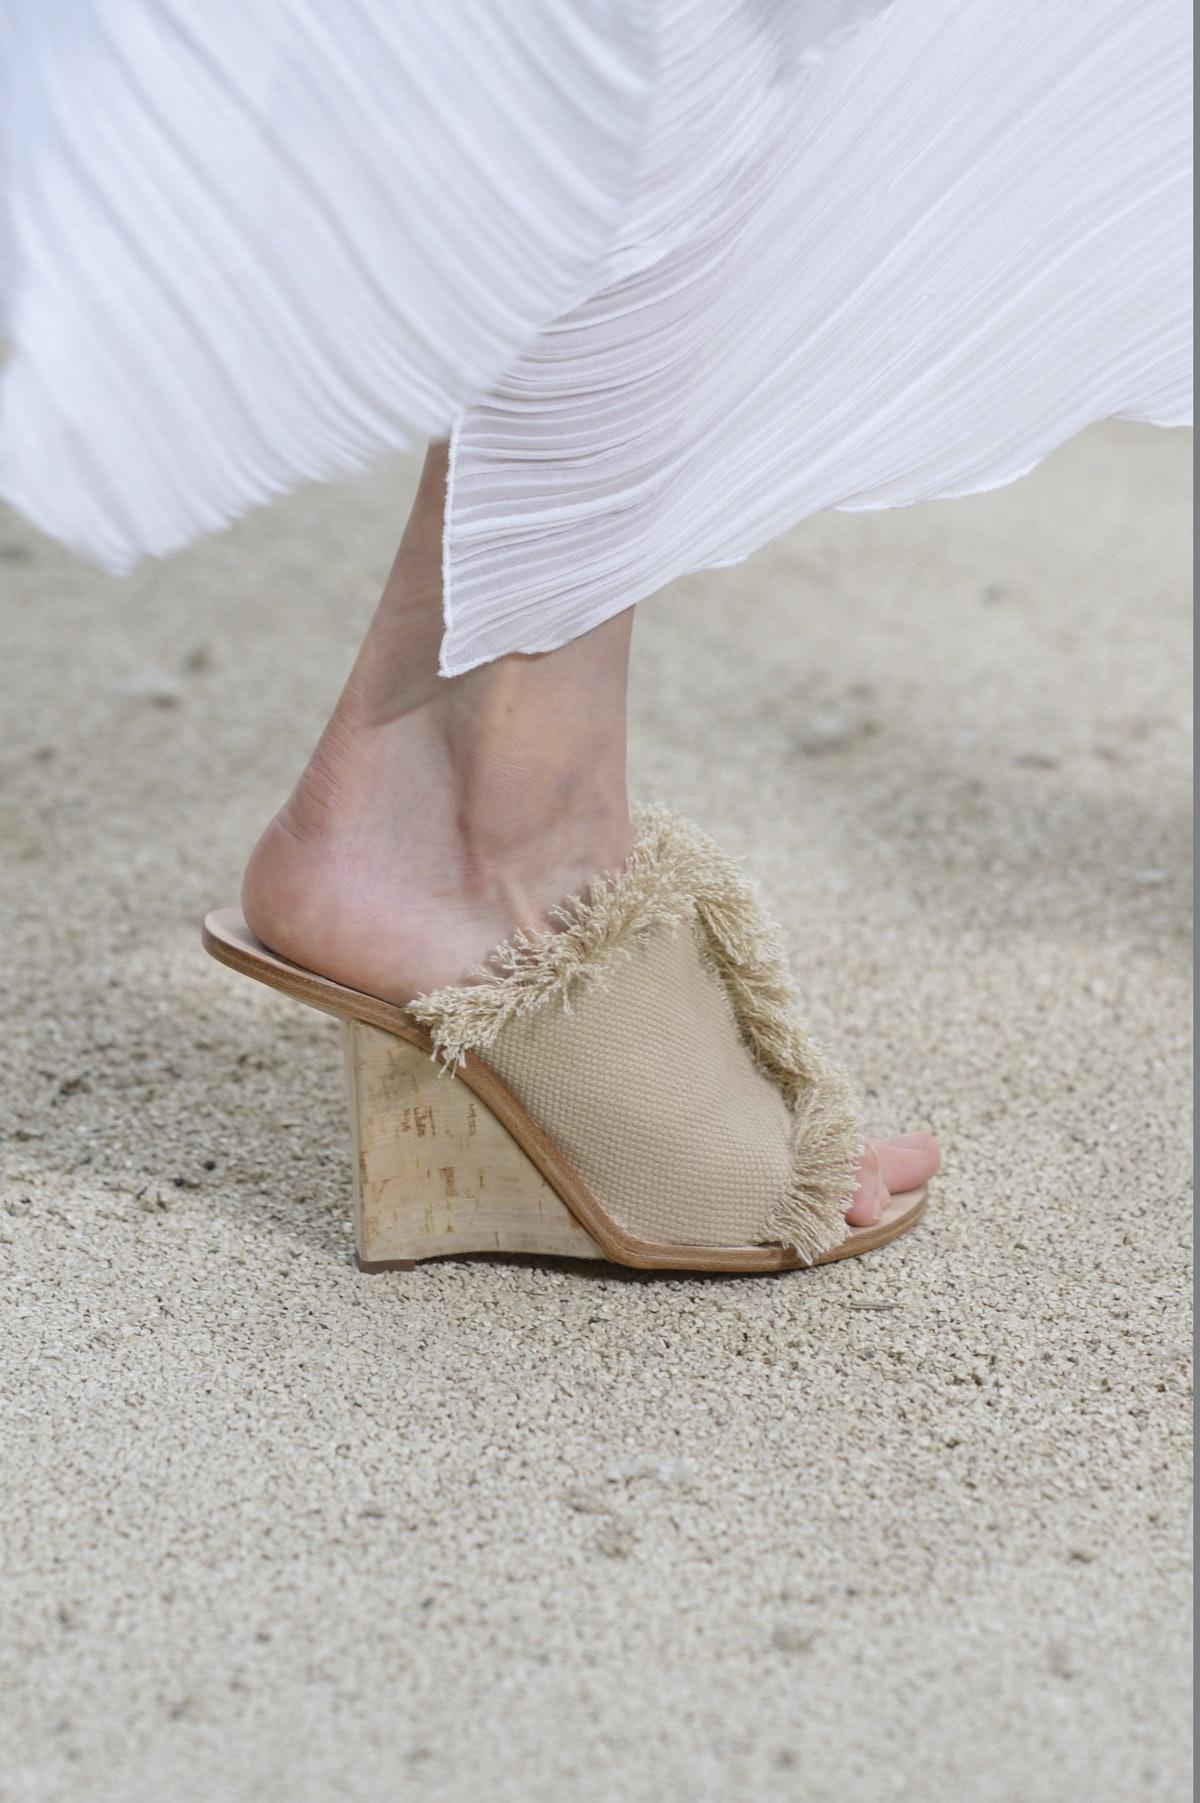 Chloe-spring-2014-shoes